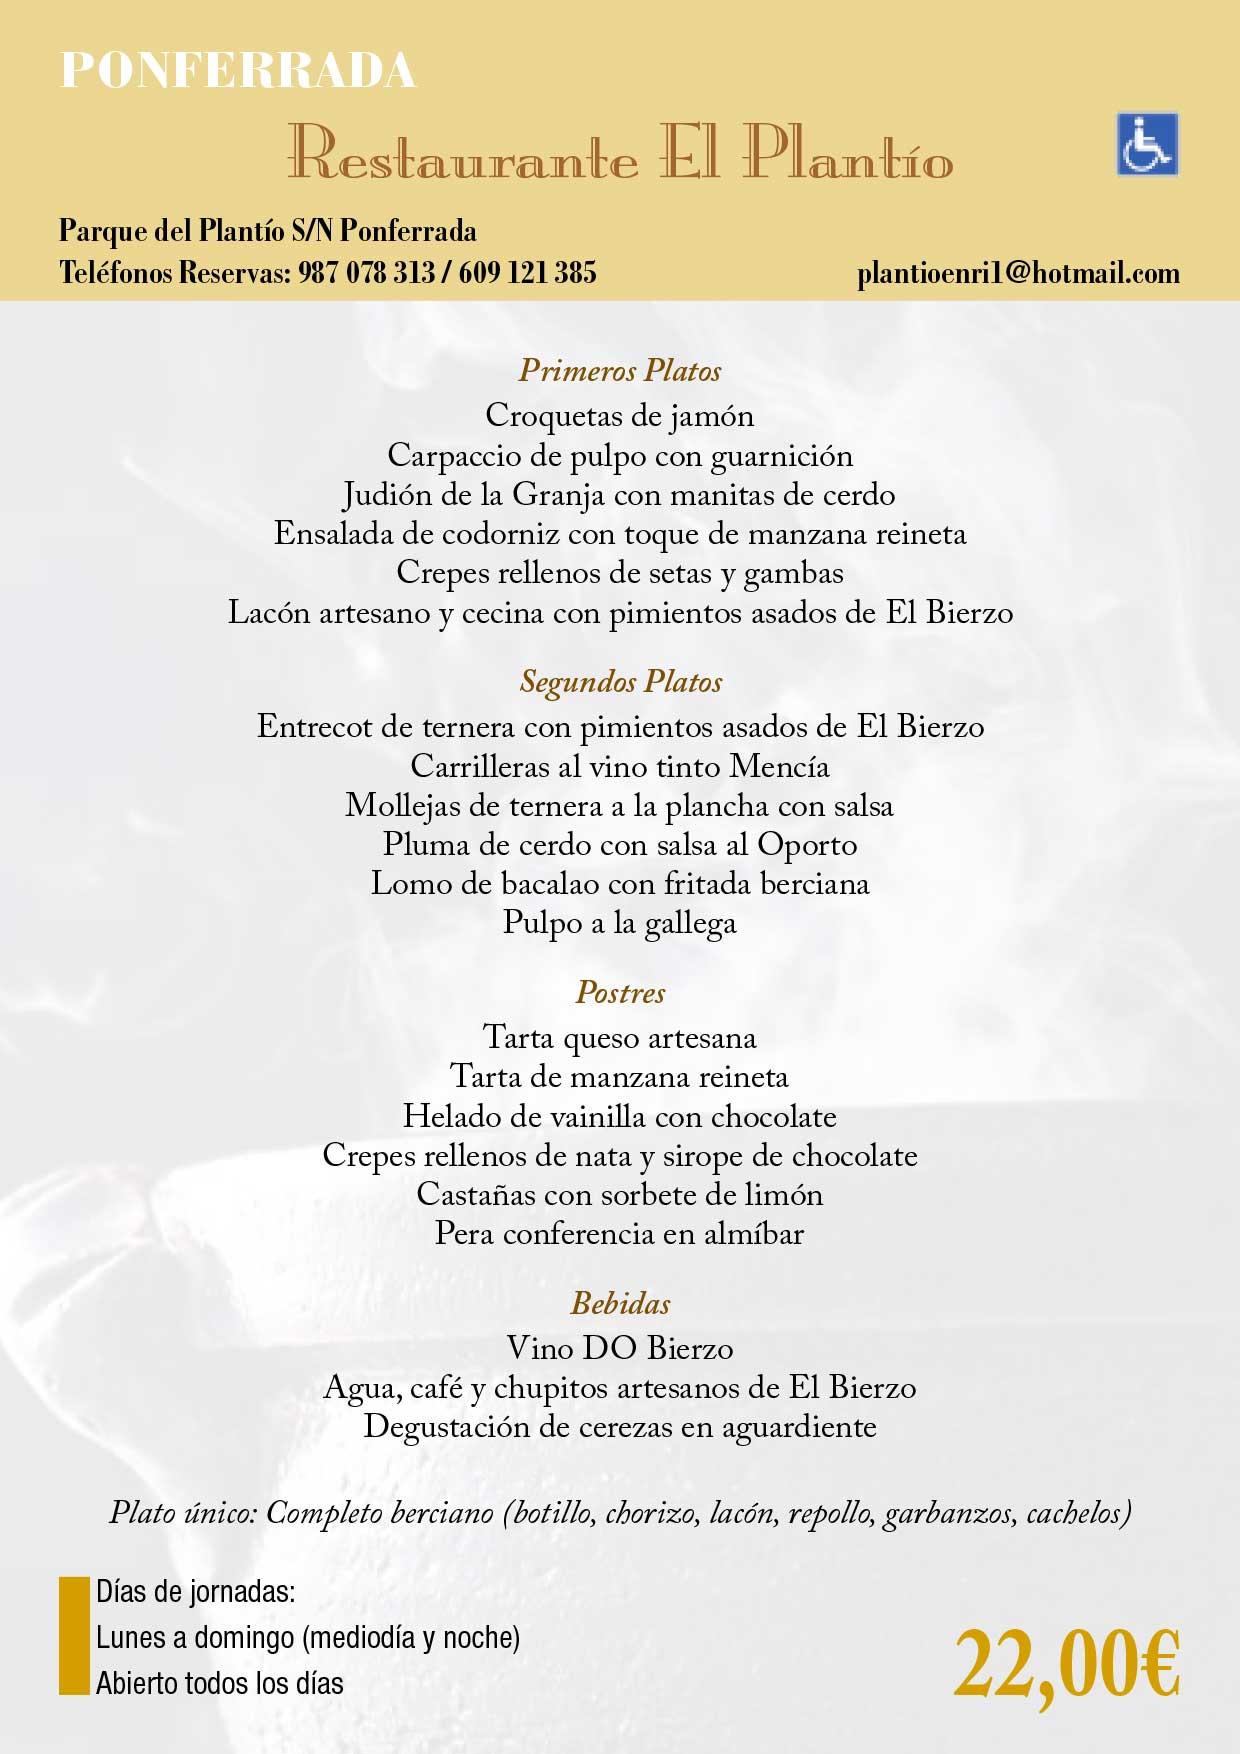 XXXIII Jornadas gastronómicas del Bierzo 2017. Restaurantes participantes 30